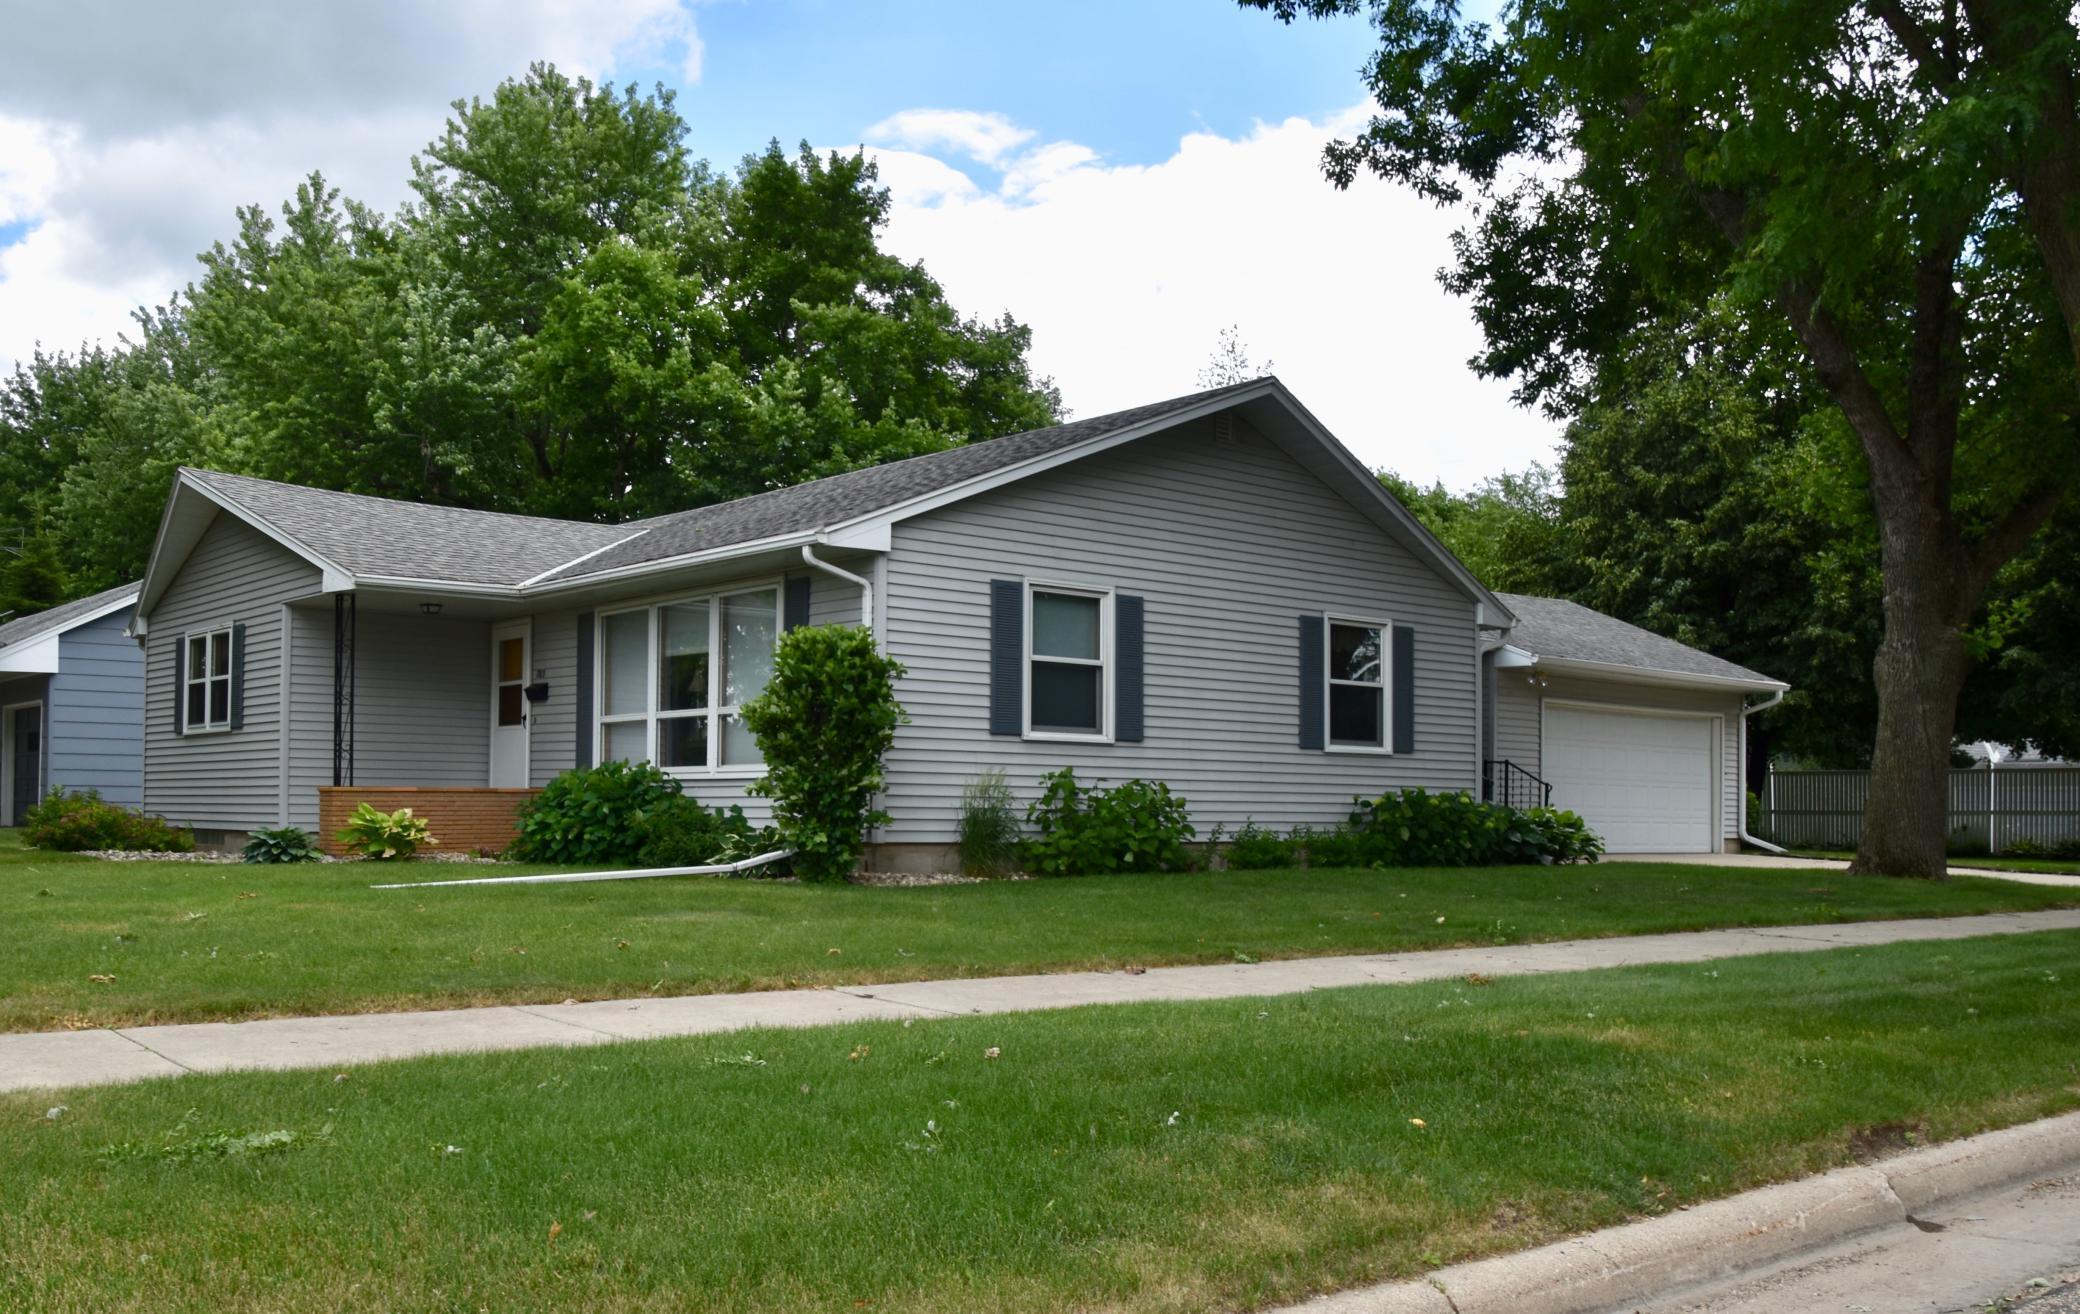 703 Poplar Property Photo - Sibley, IA real estate listing